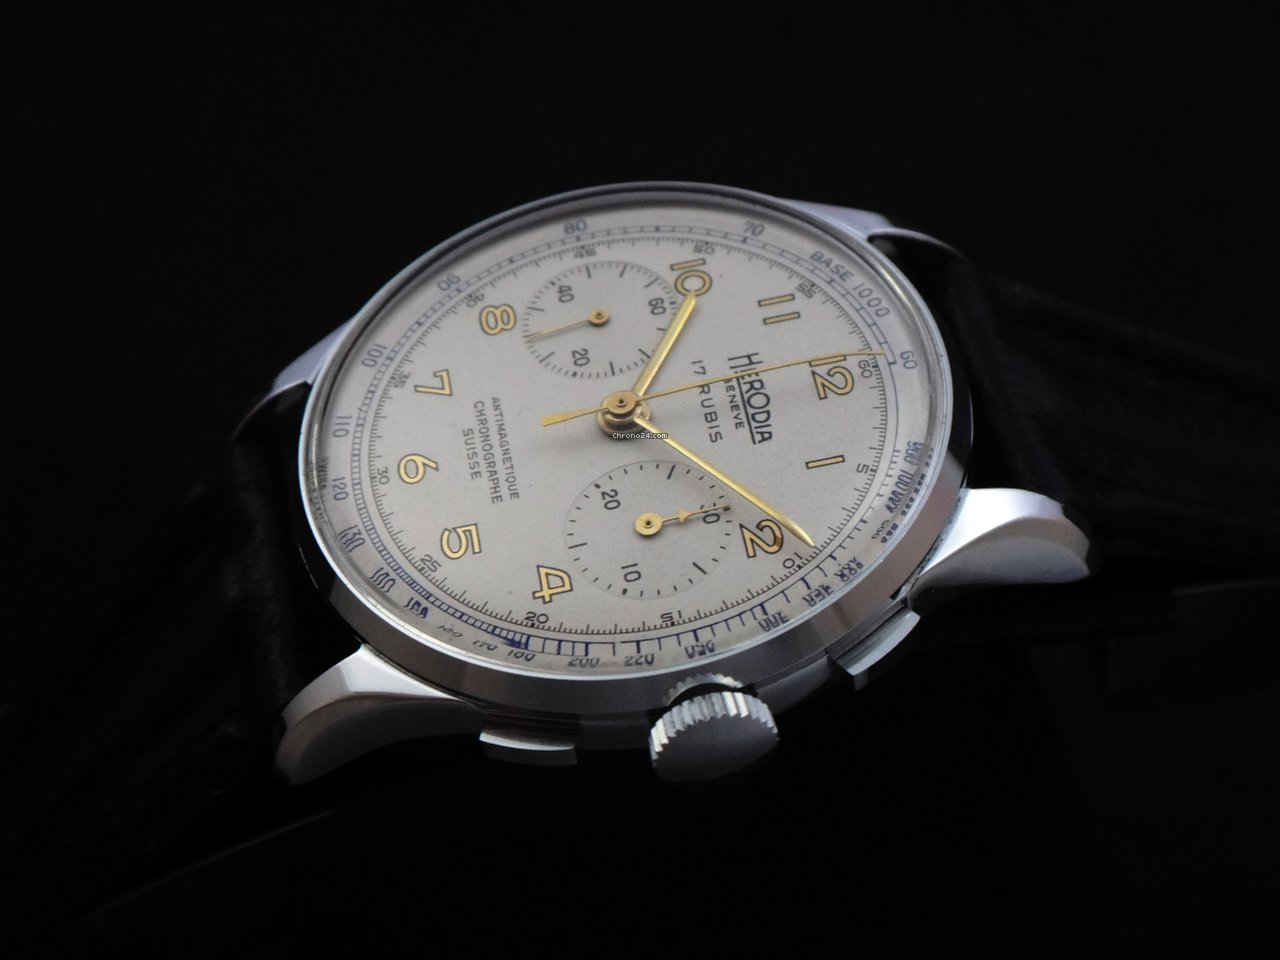 herodia landeron chronograph 60 39 s nos verkauft auf chrono24. Black Bedroom Furniture Sets. Home Design Ideas